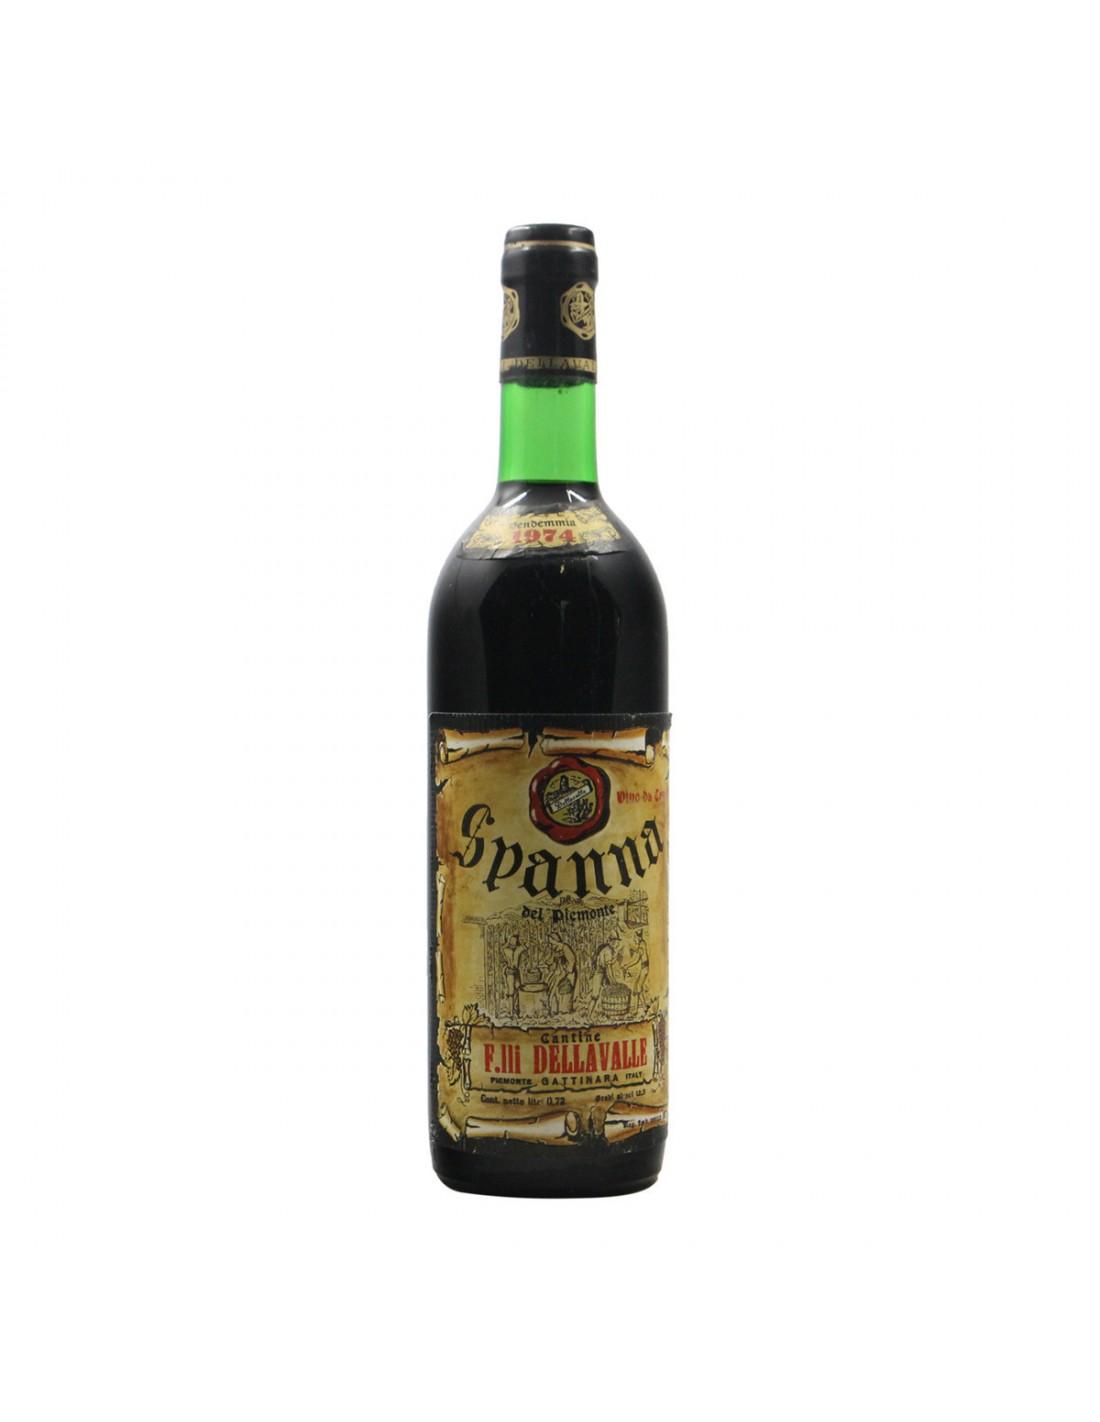 SPANNA 1974 CANTINE DELLA VALLE Grandi Bottiglie